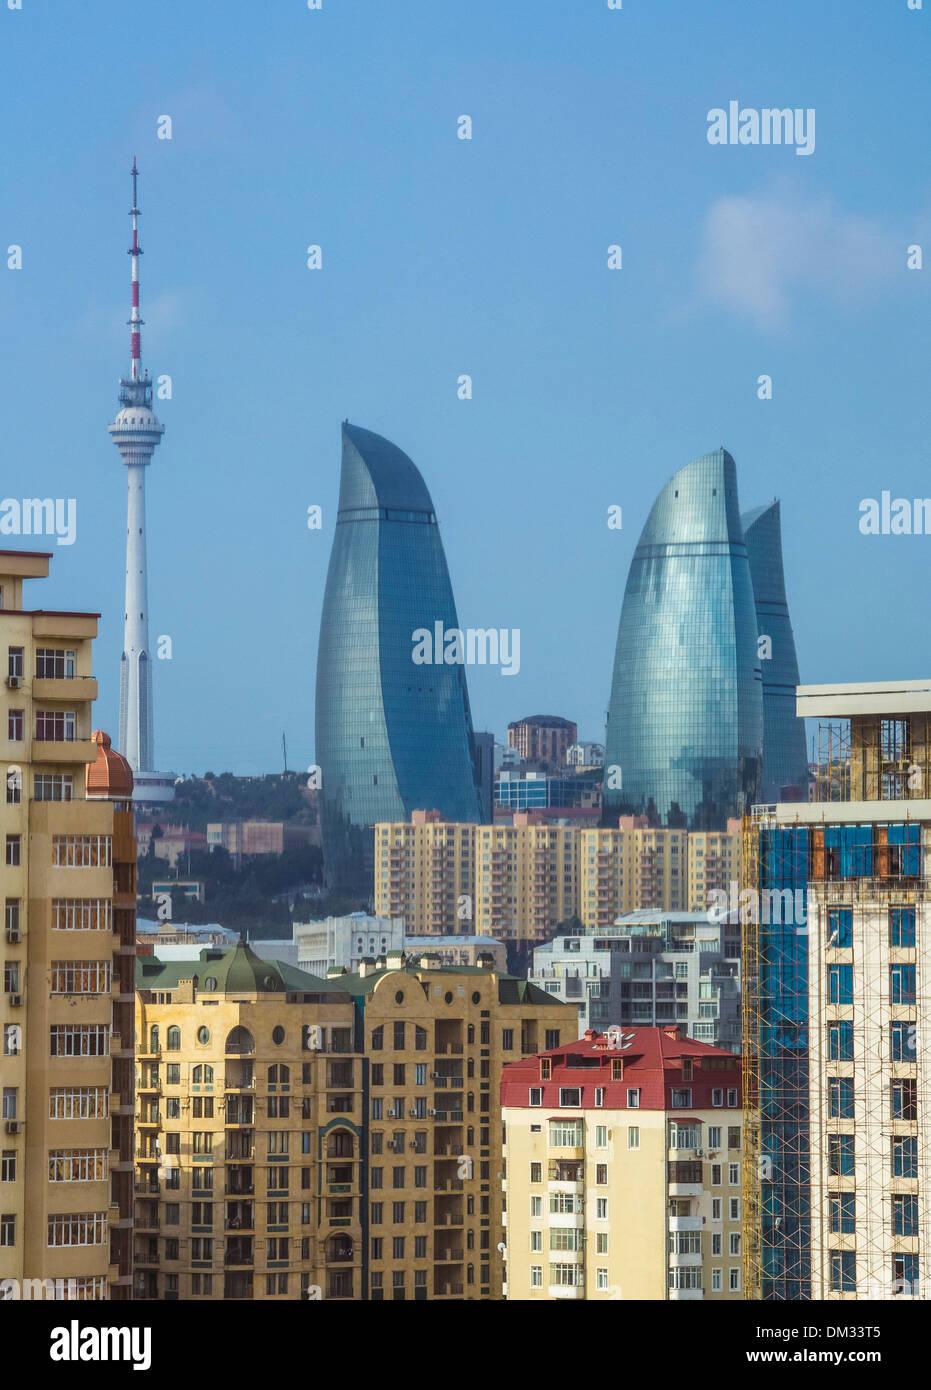 Azerbaijan, Caucasus, Eurasia, Baku, City, Flame, Tele, architecture, new, skyline, tower, modern, Flame towers - Stock Image